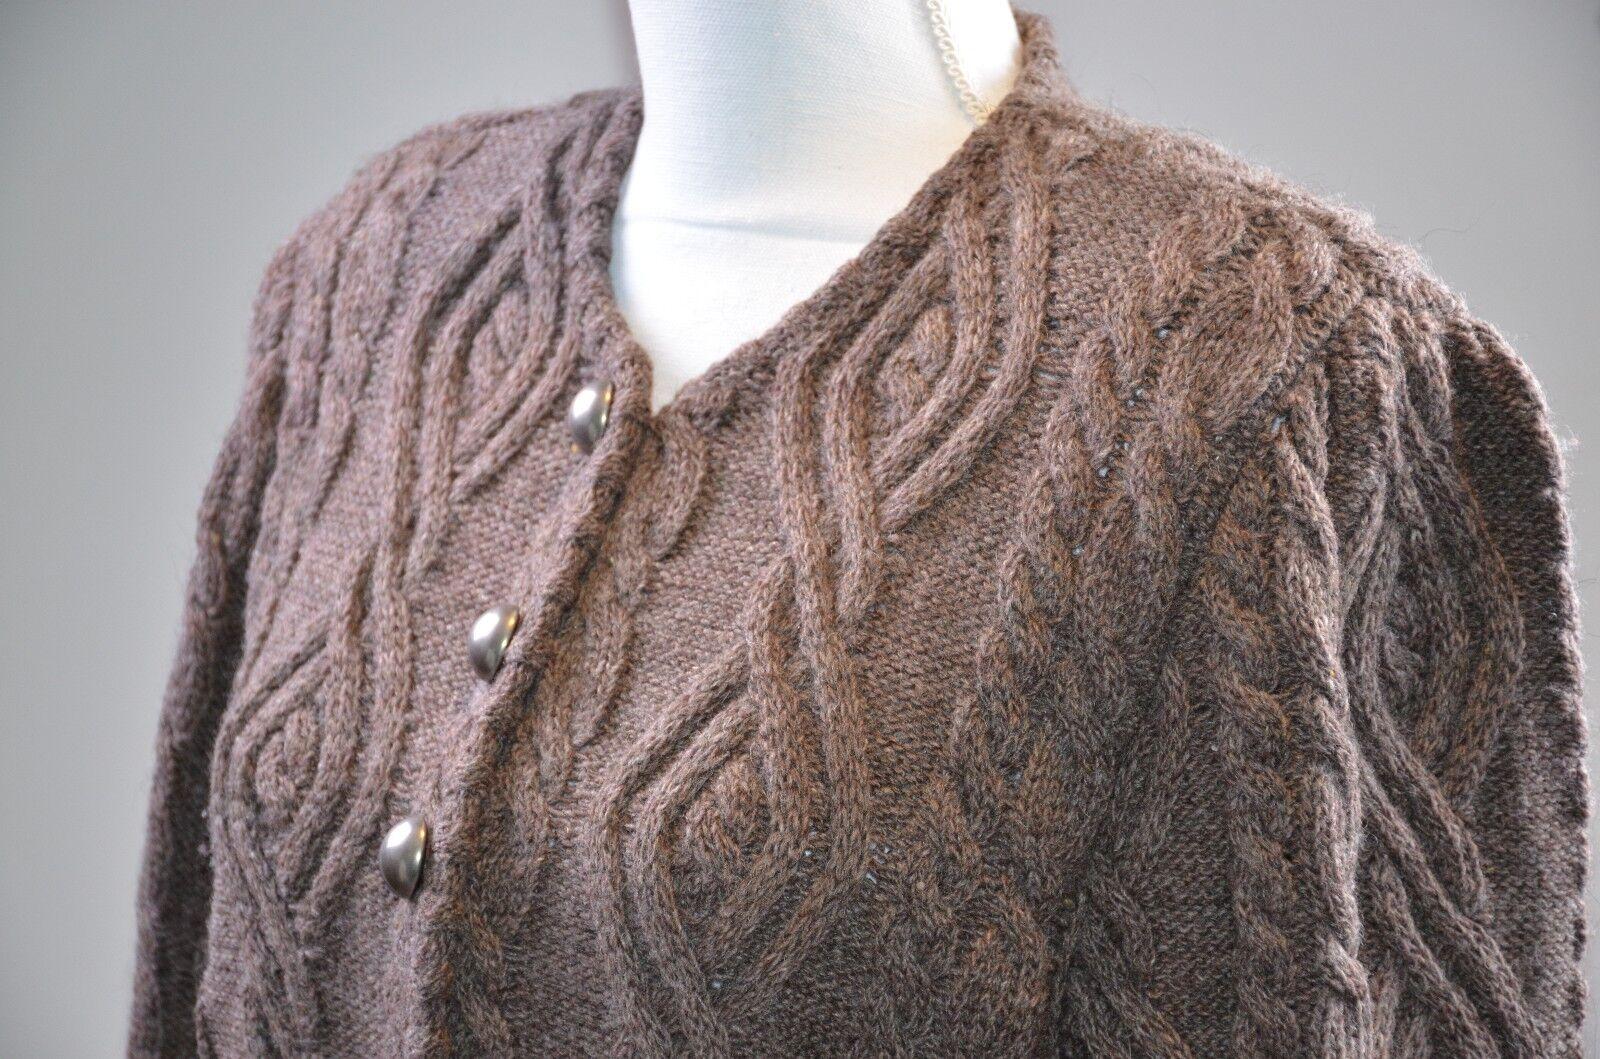 Steffner Country Women's Sweater Sweater Sweater Sz 40 Eu Knit Button Down Wool Alpaca 8 US Warm 5df8a9